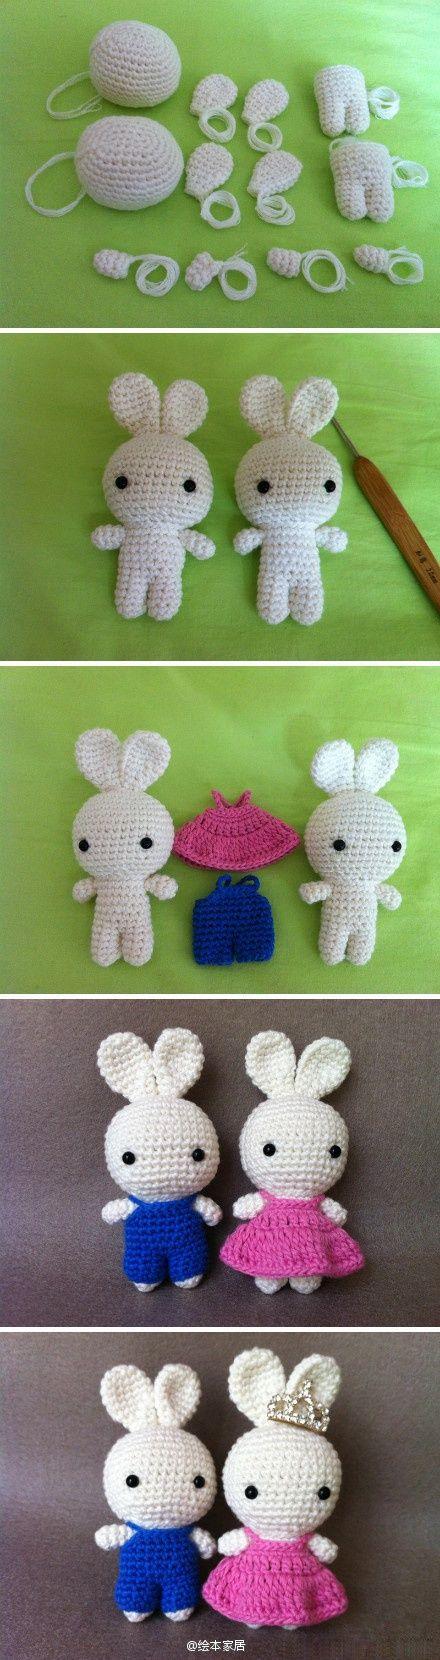 crocheted rabbits